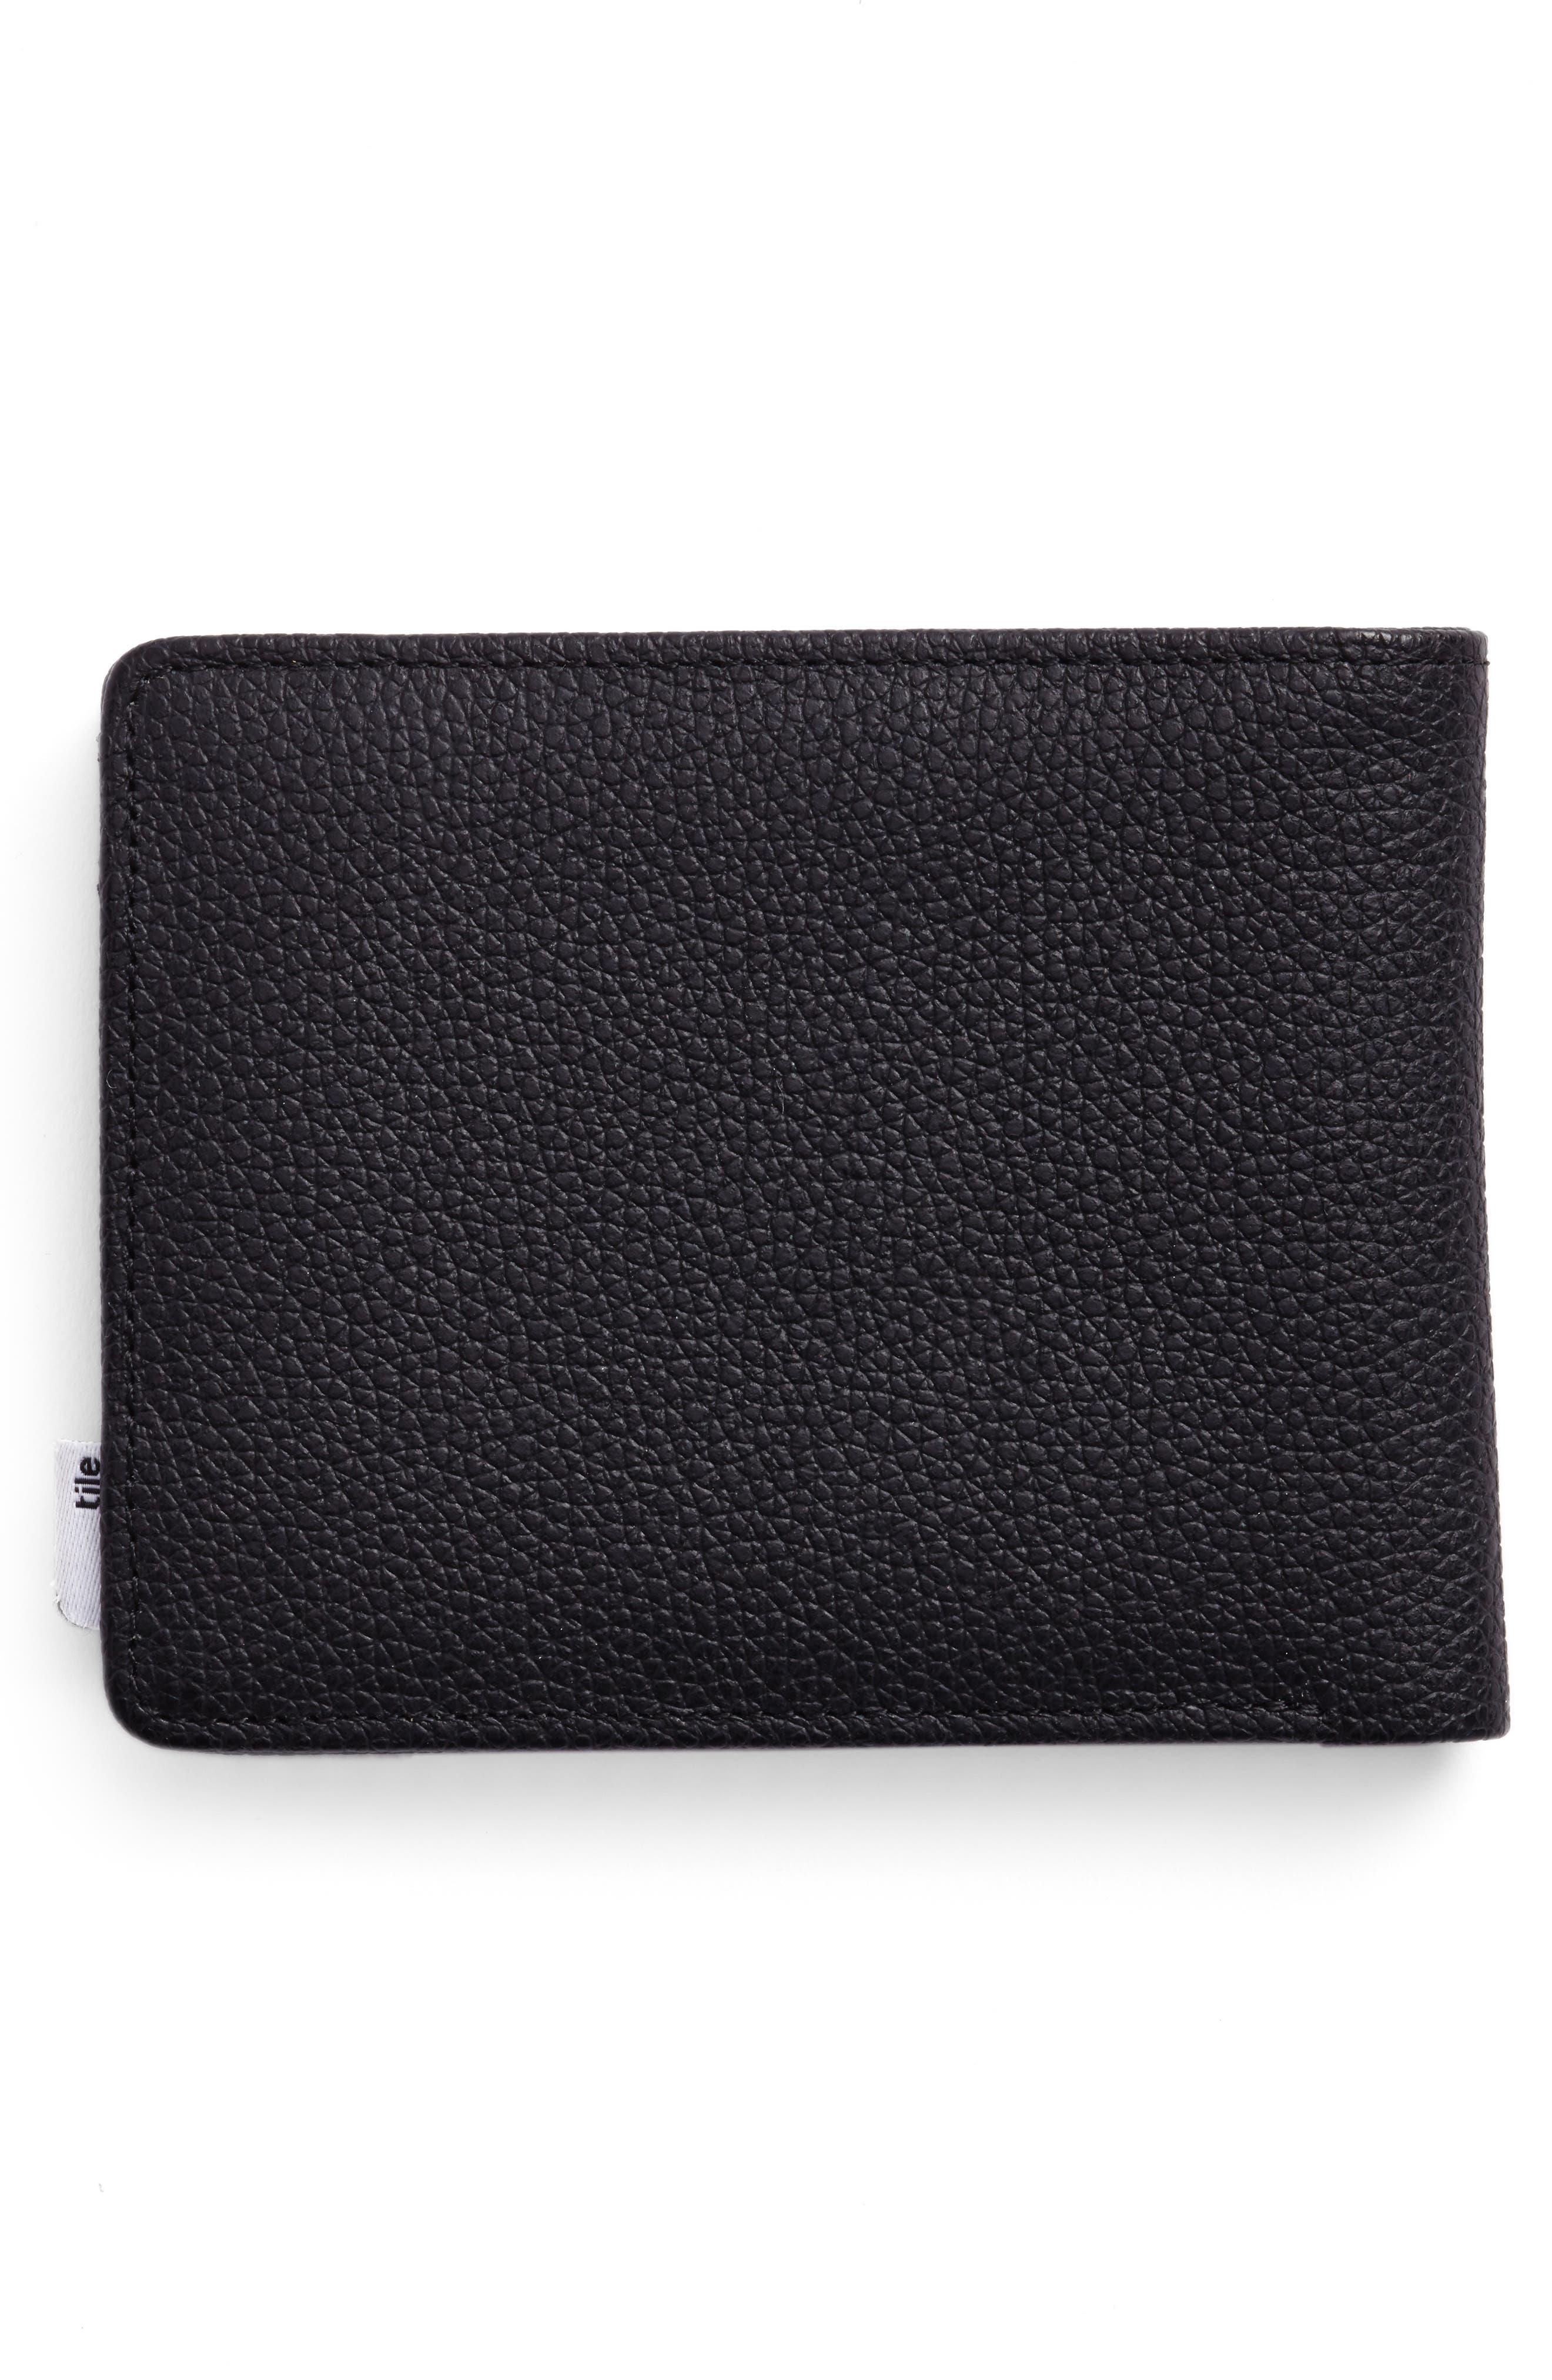 Tile Roy Leather Wallet,                             Alternate thumbnail 3, color,                             001